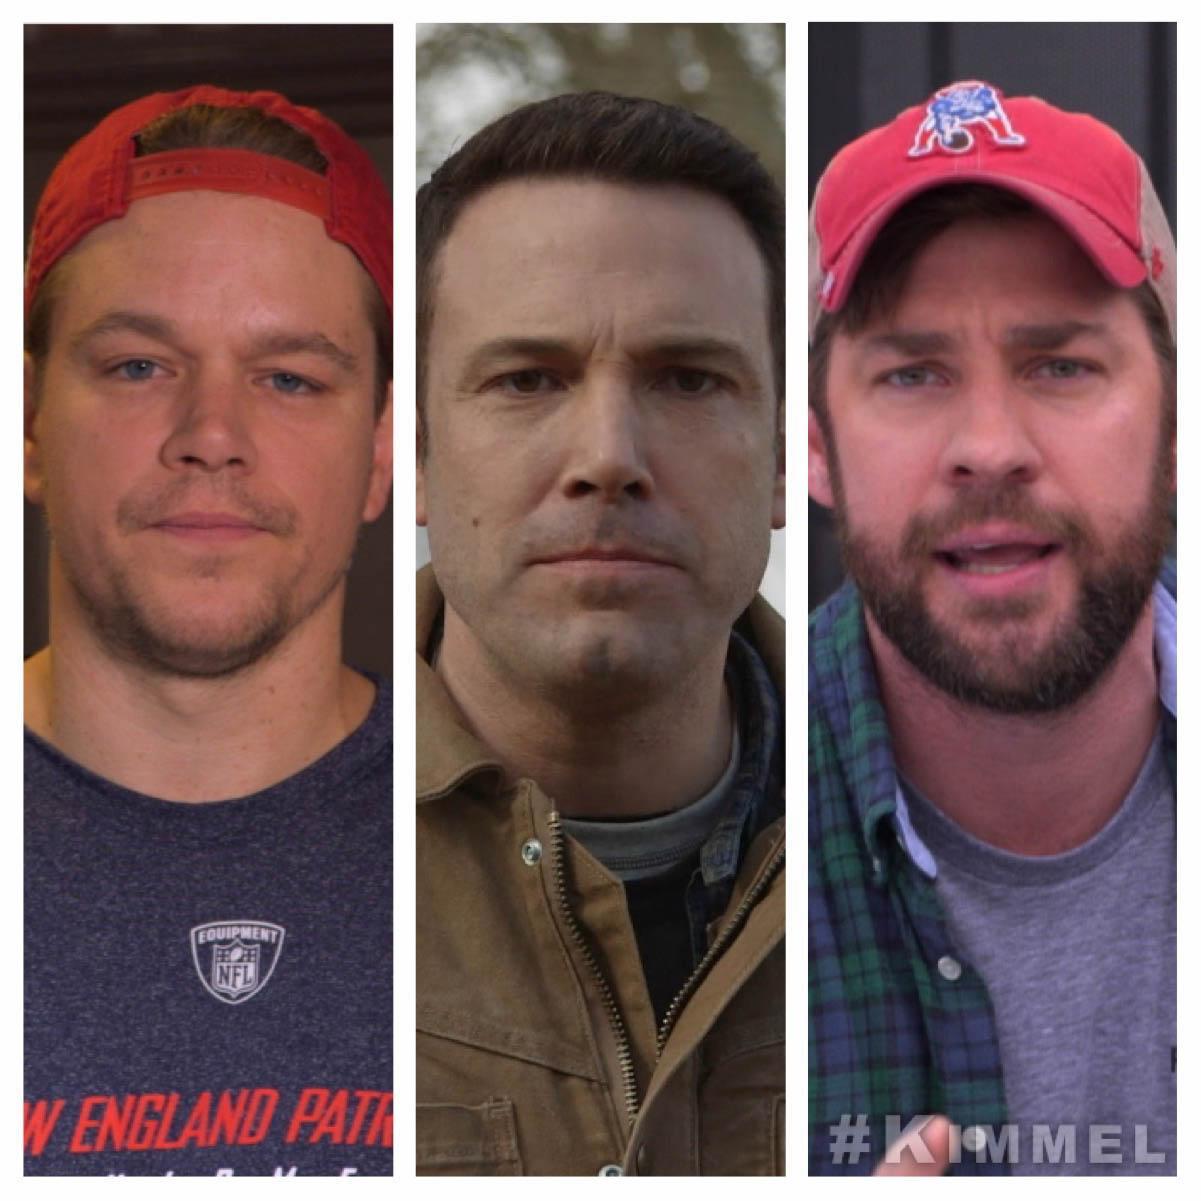 RT @JimmyKimmelLive: #MattDamon @BenAffleck @JohnKrasinski & more defend their beloved Tom Brady TONIGHT on #Kimmel. #DeflateGate #SB49 htt…